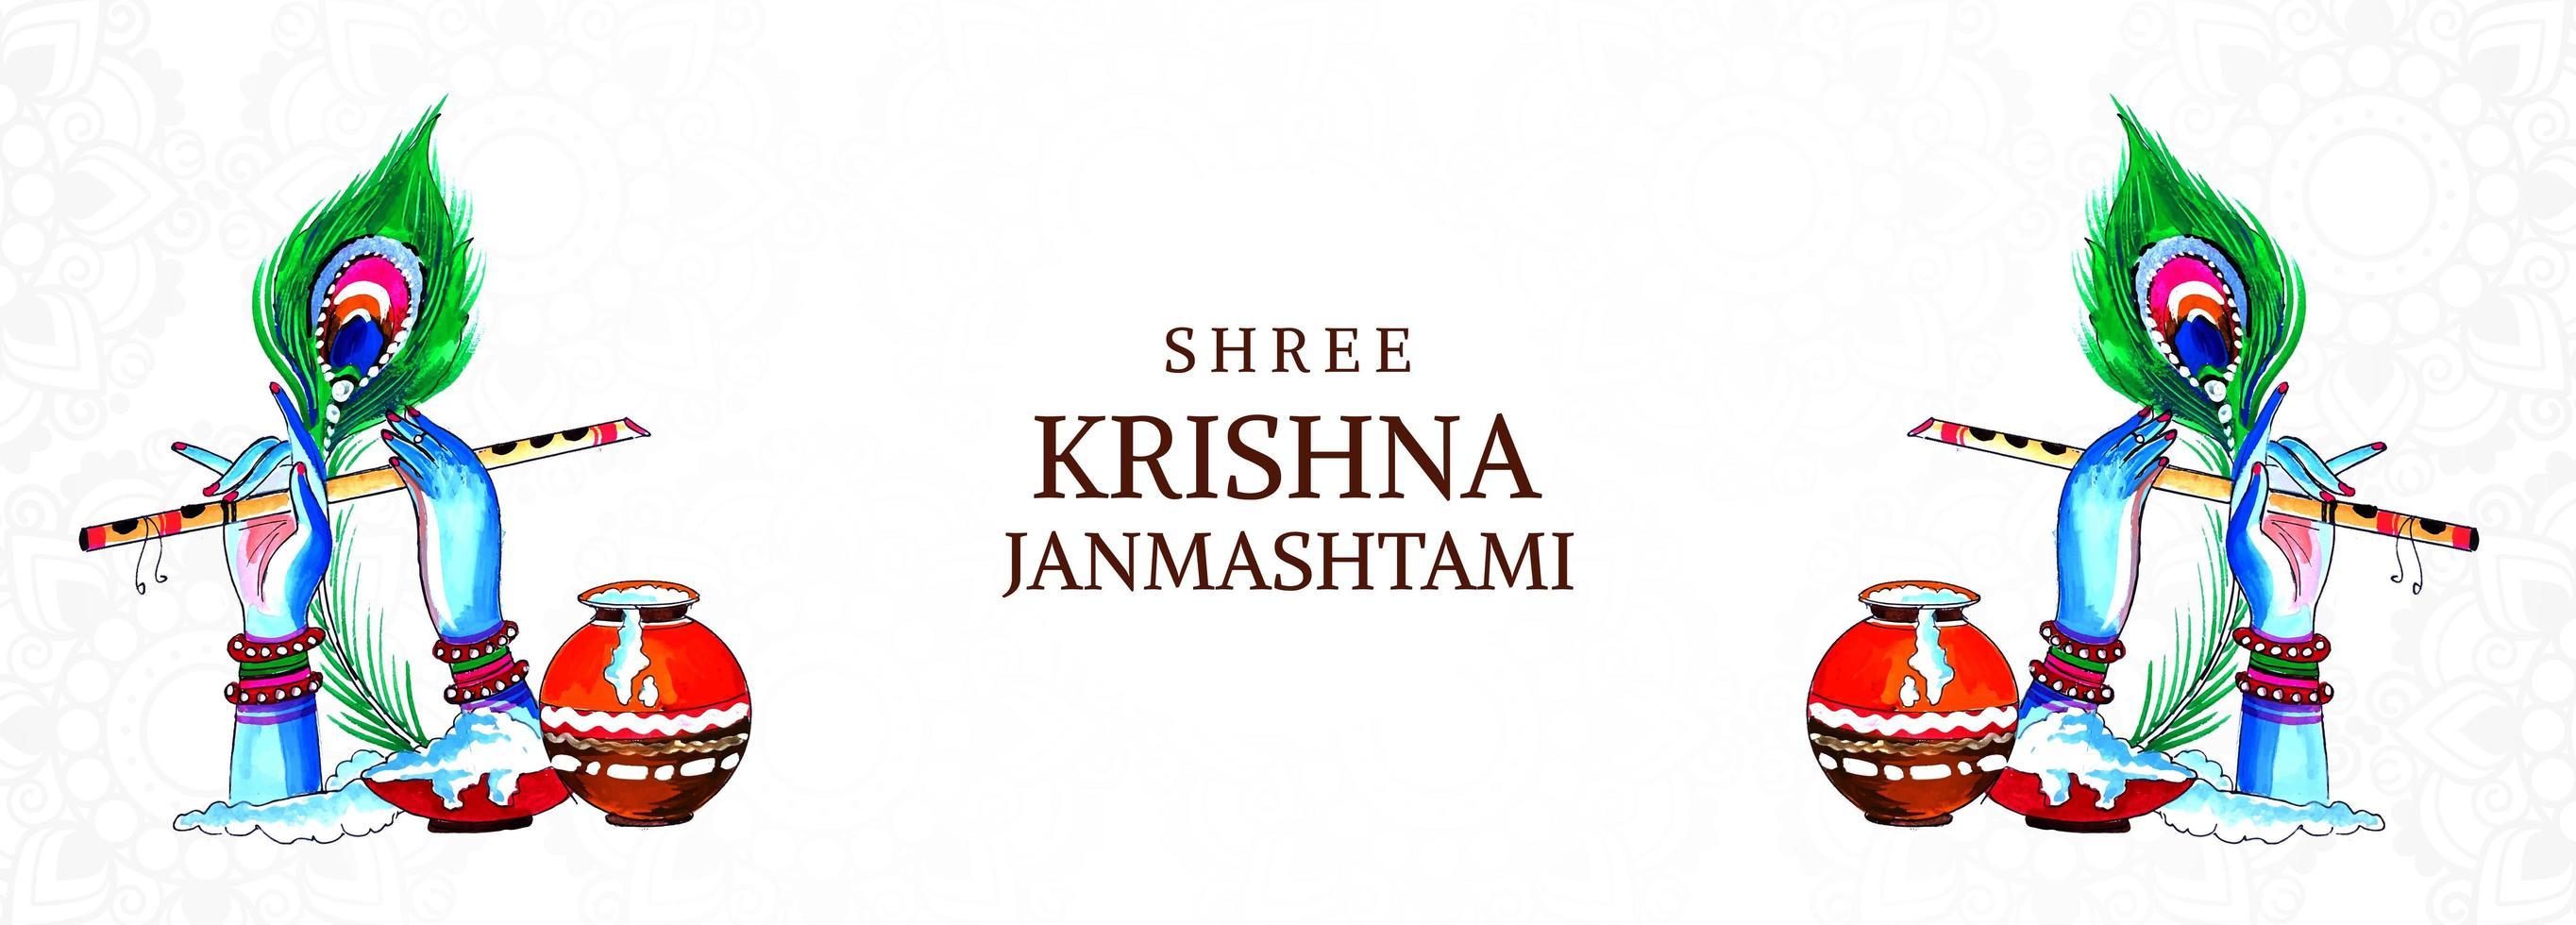 festival gelukkige krishna janmashtami handen en fluit banner vector